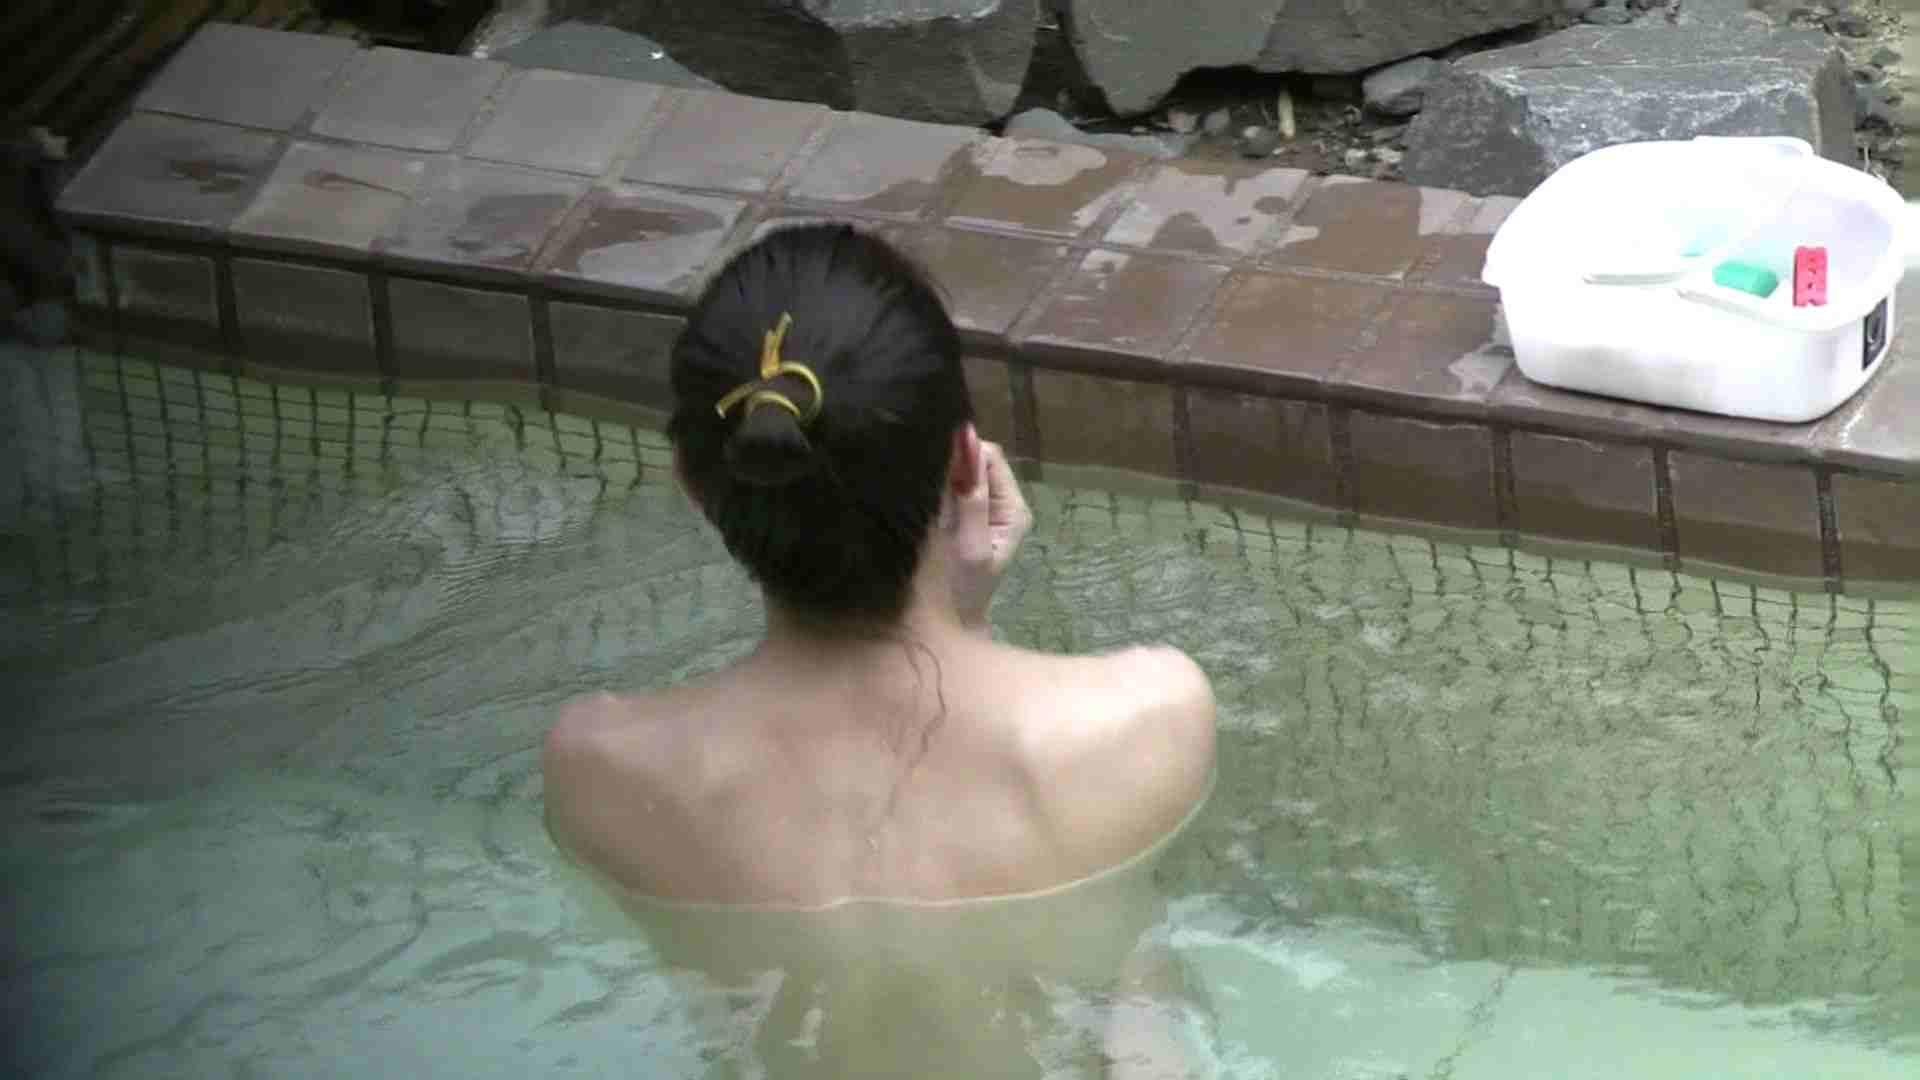 Aquaな露天風呂Vol.653 盗撮映像  67Pix 8